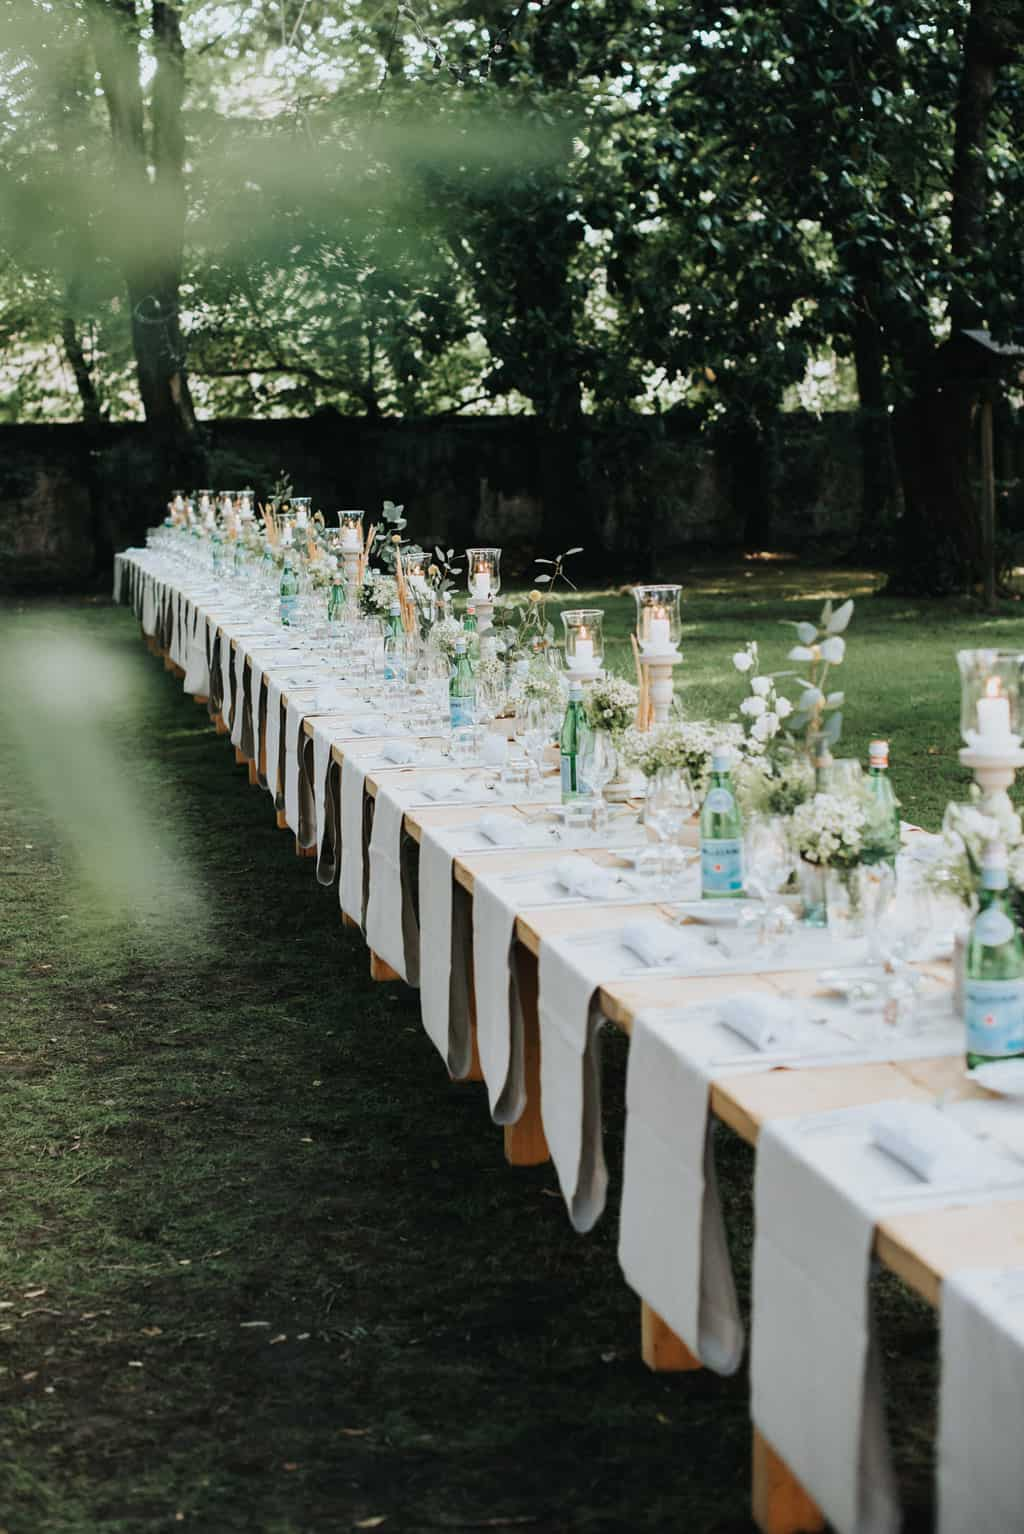 890 matrimonio riviera del brenta Matrimonio Villa Valier   Mira   Riviera del Brenta   Venezia